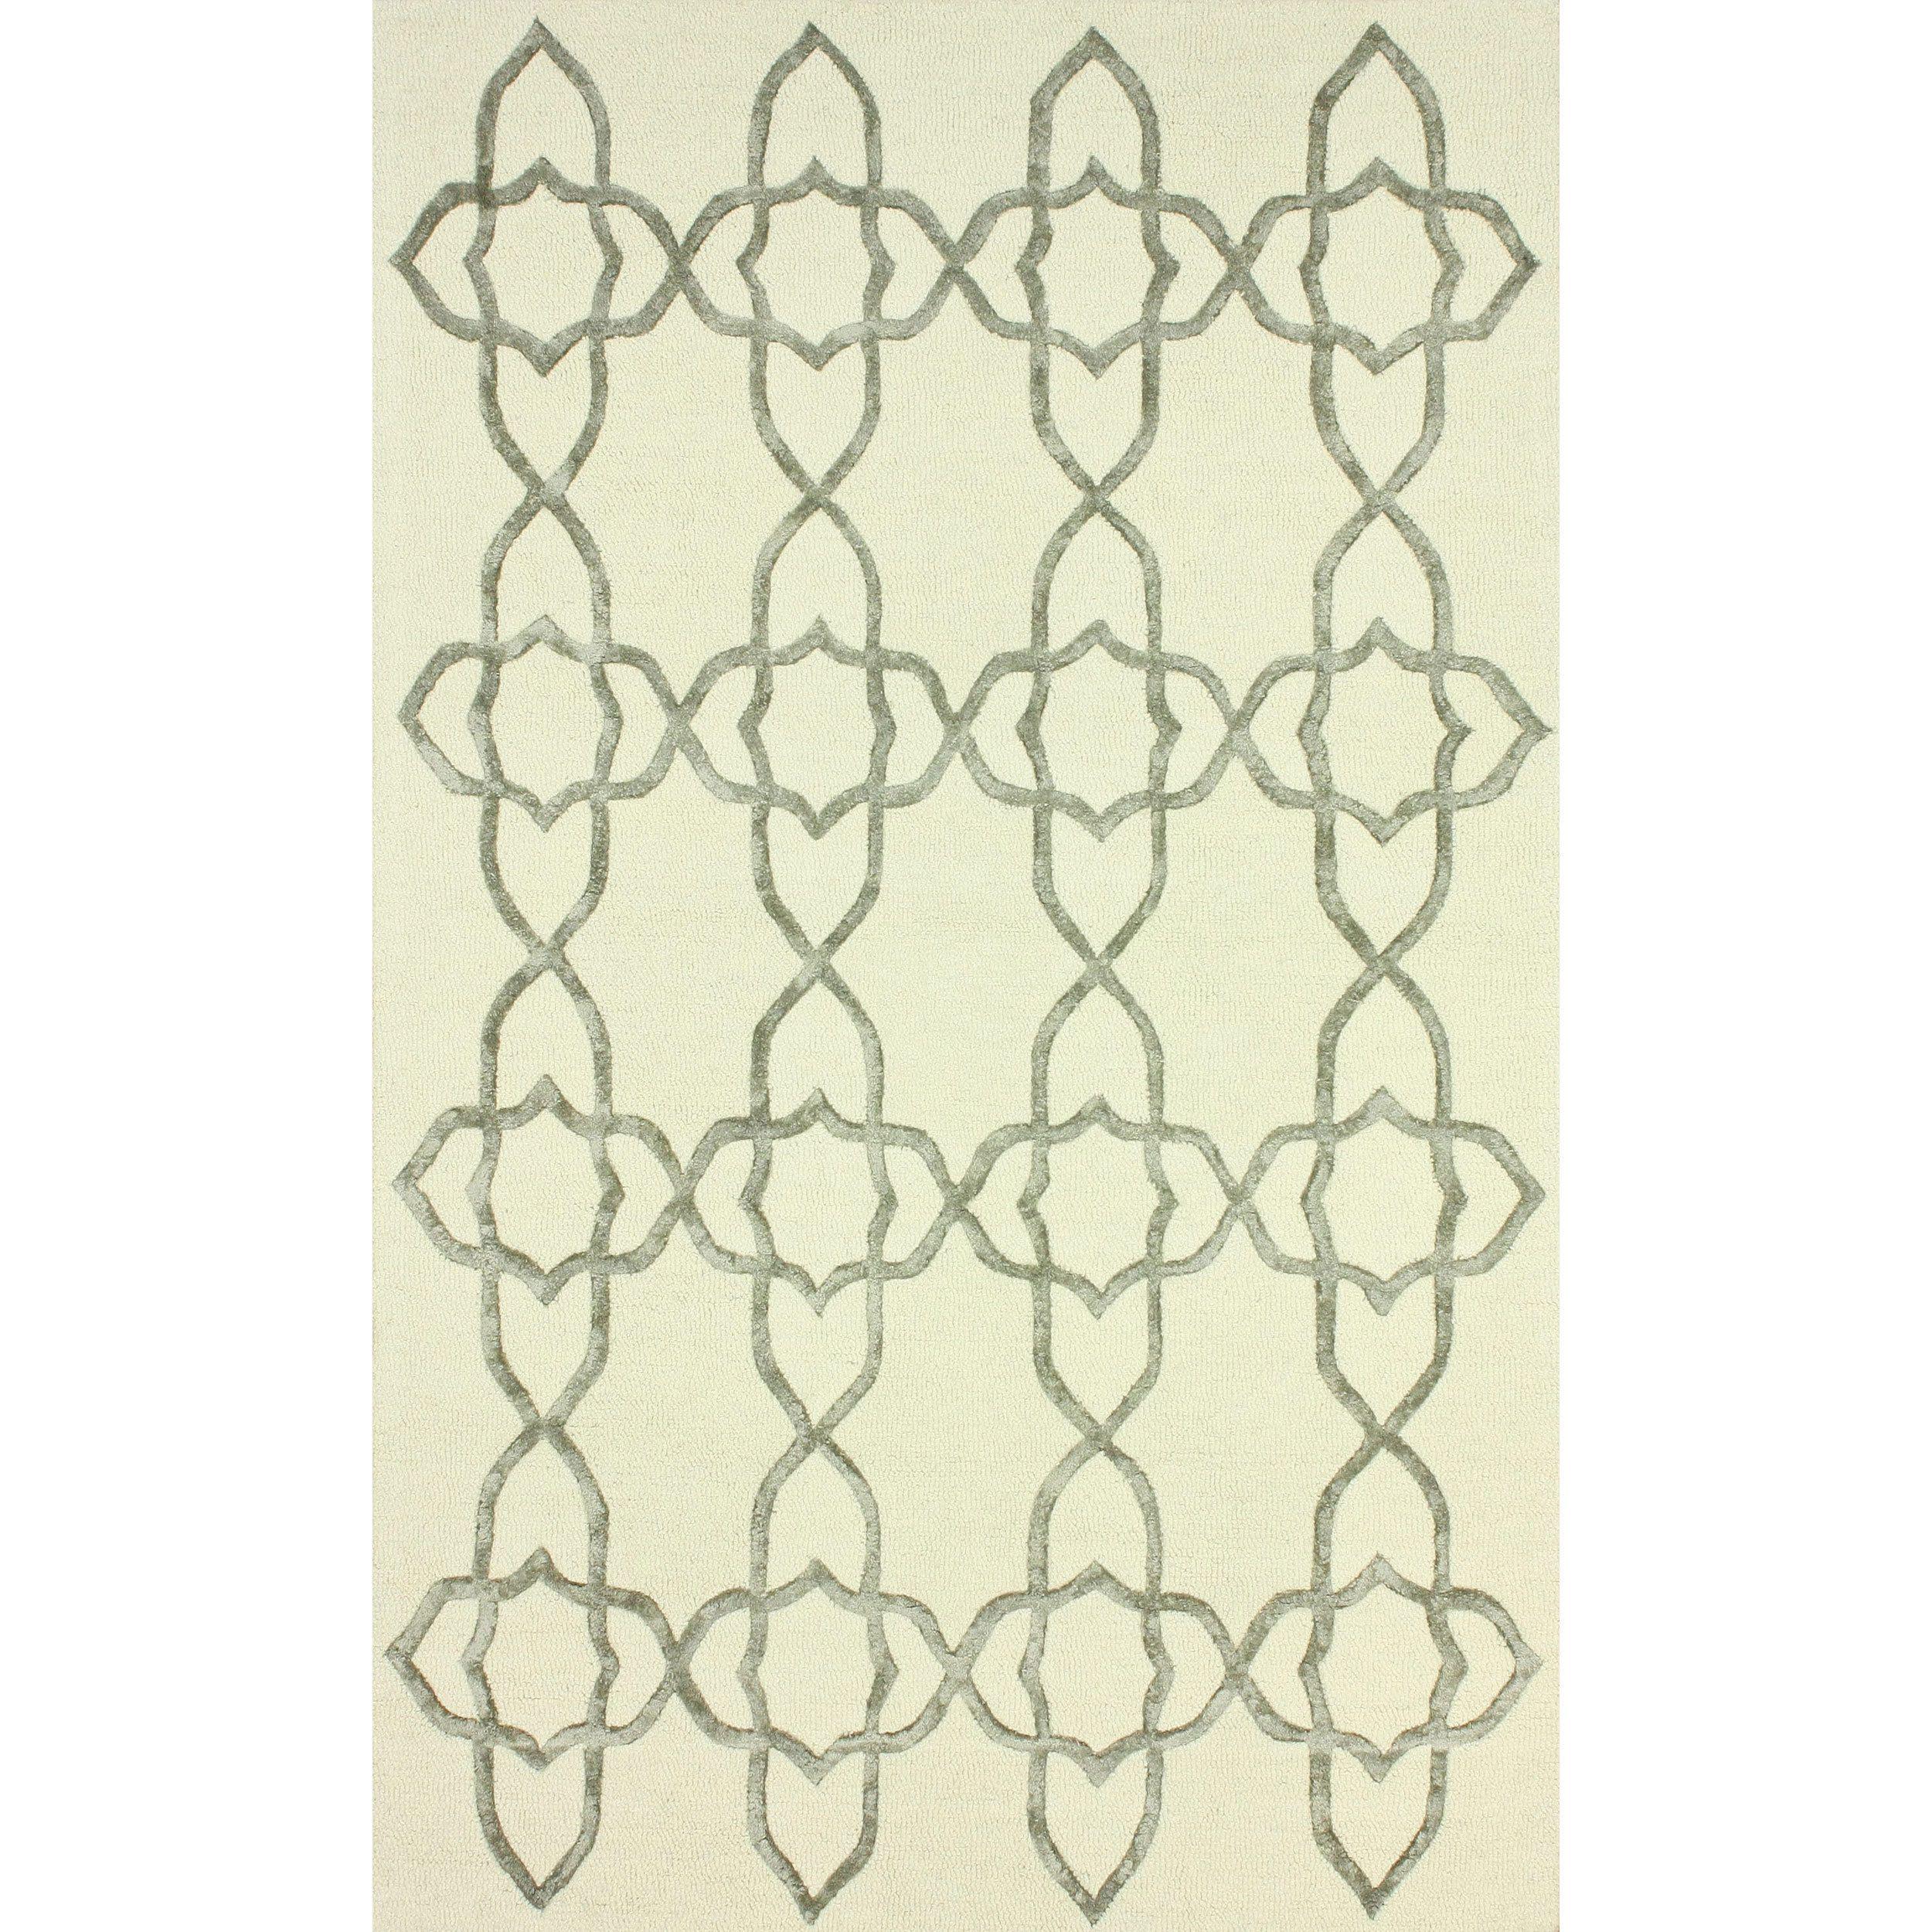 nuLOOM Handmade Wool/ Viscose Trellis Silver Area Rug (7'6 x 9'6 ... - nuLOOM Handmade Wool/ Trellis Silver Area Rug